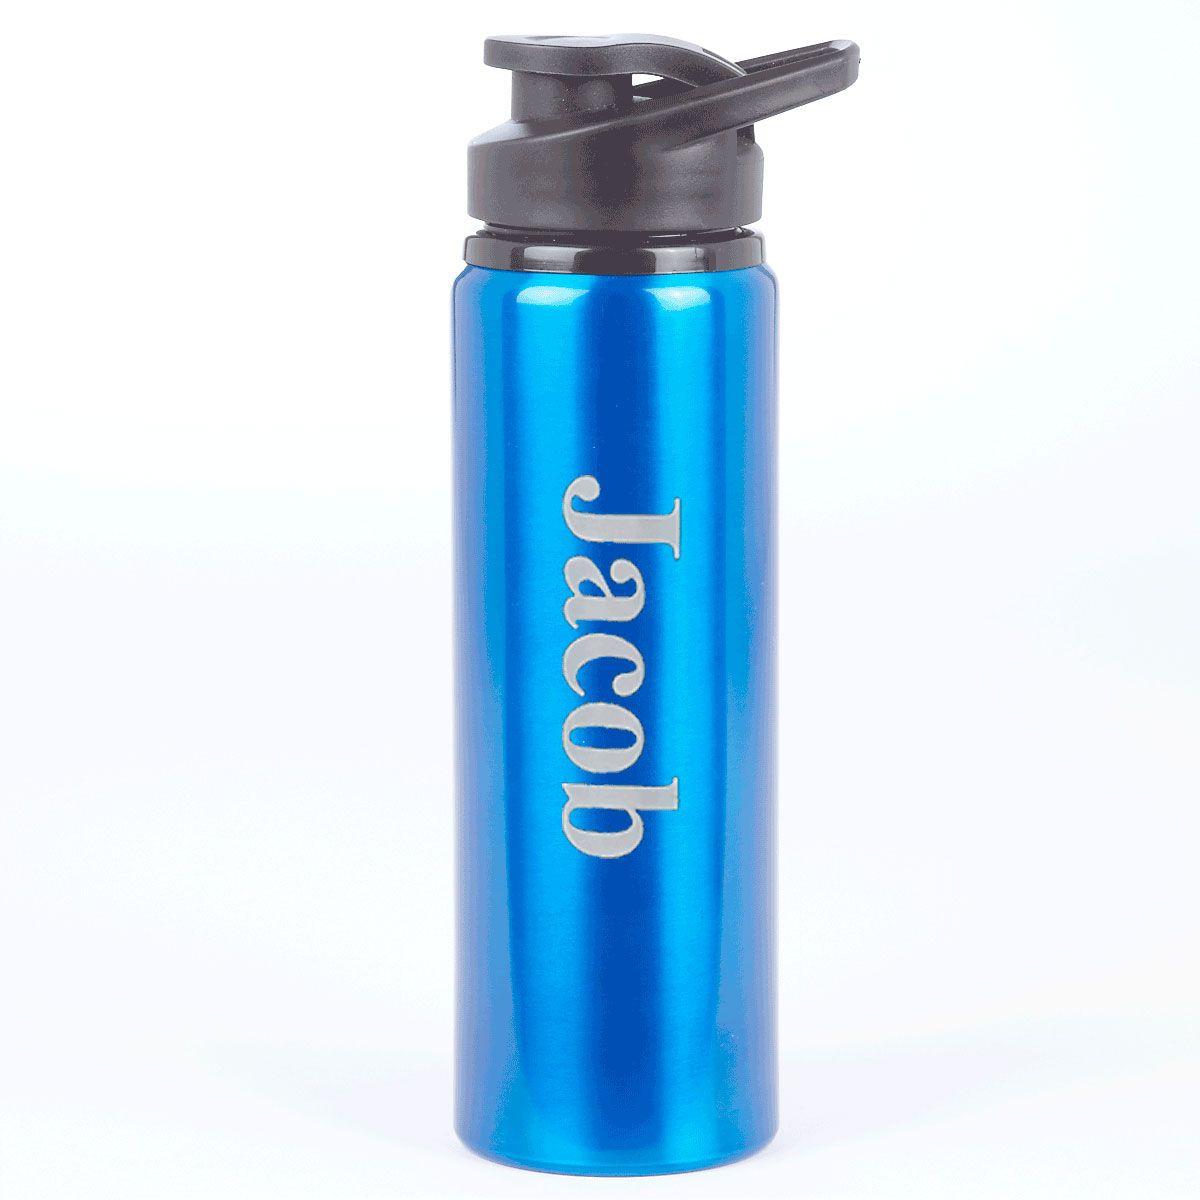 Blue Personalized Anodized Aluminum Water Bottle